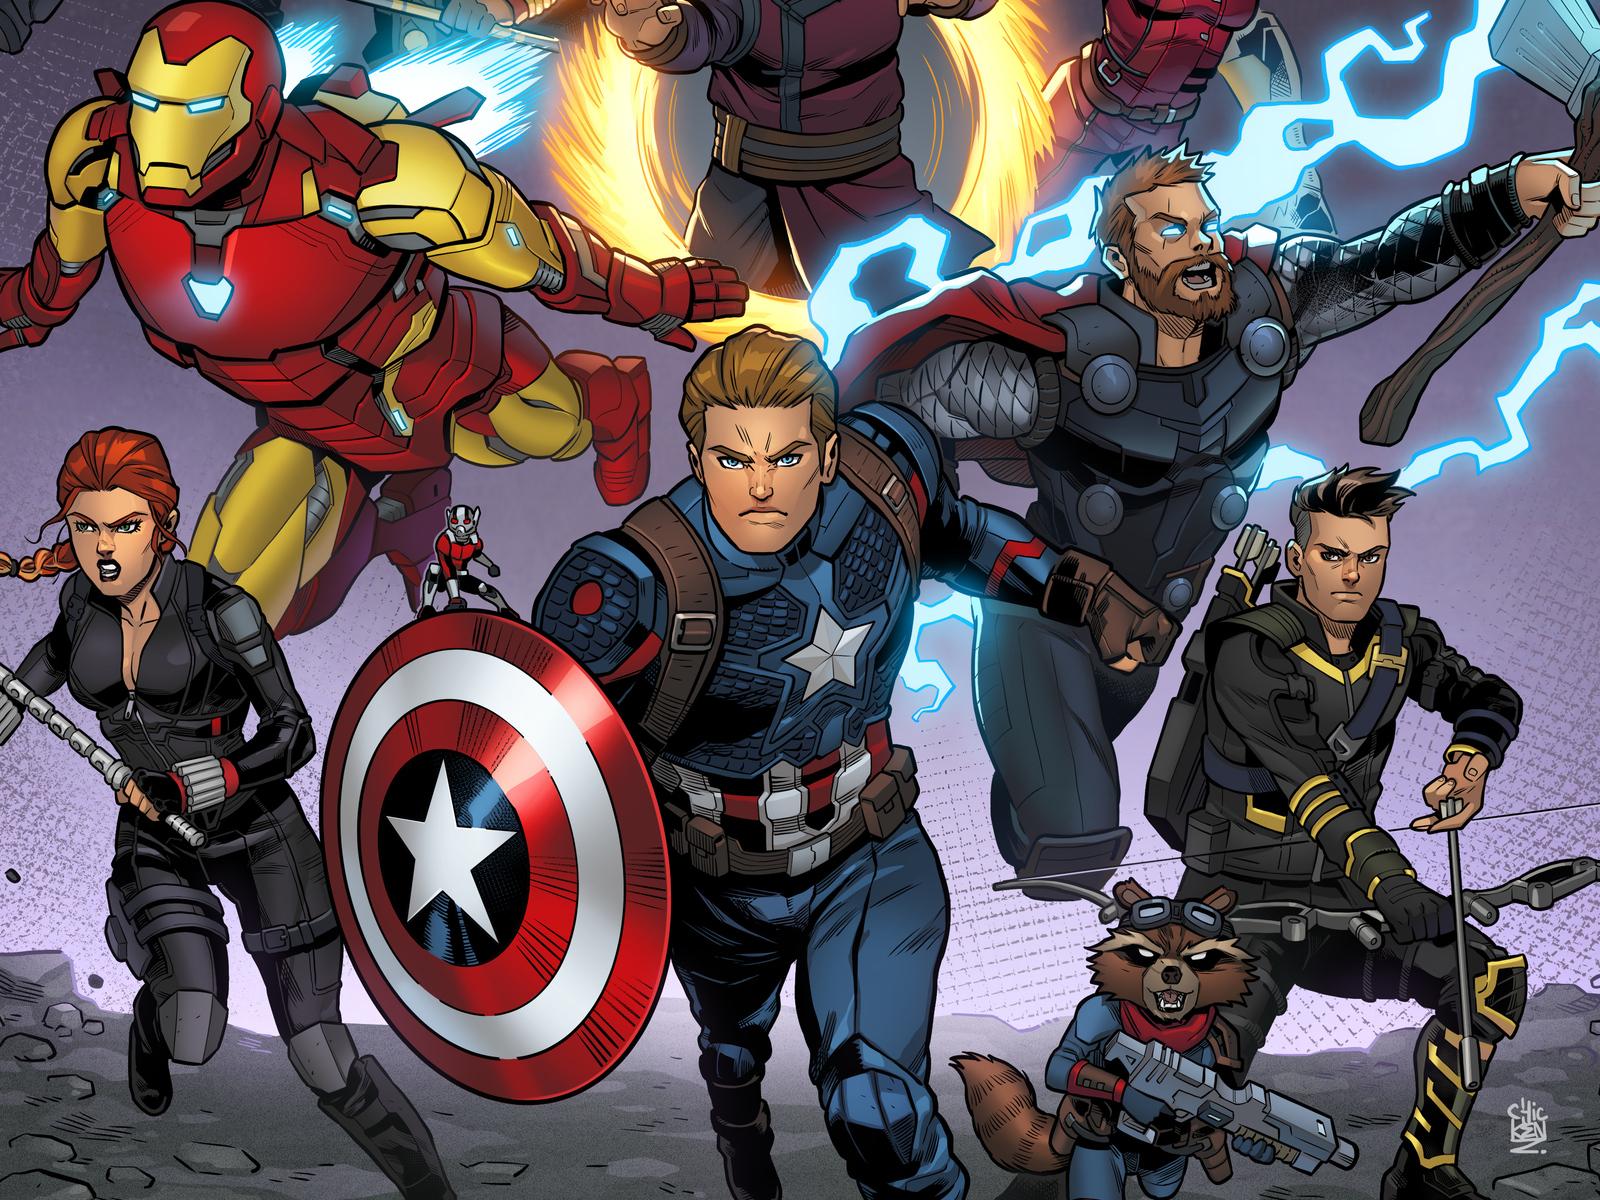 1600x1200 Avengers Endgame Final Fight 1600x1200 Resolution